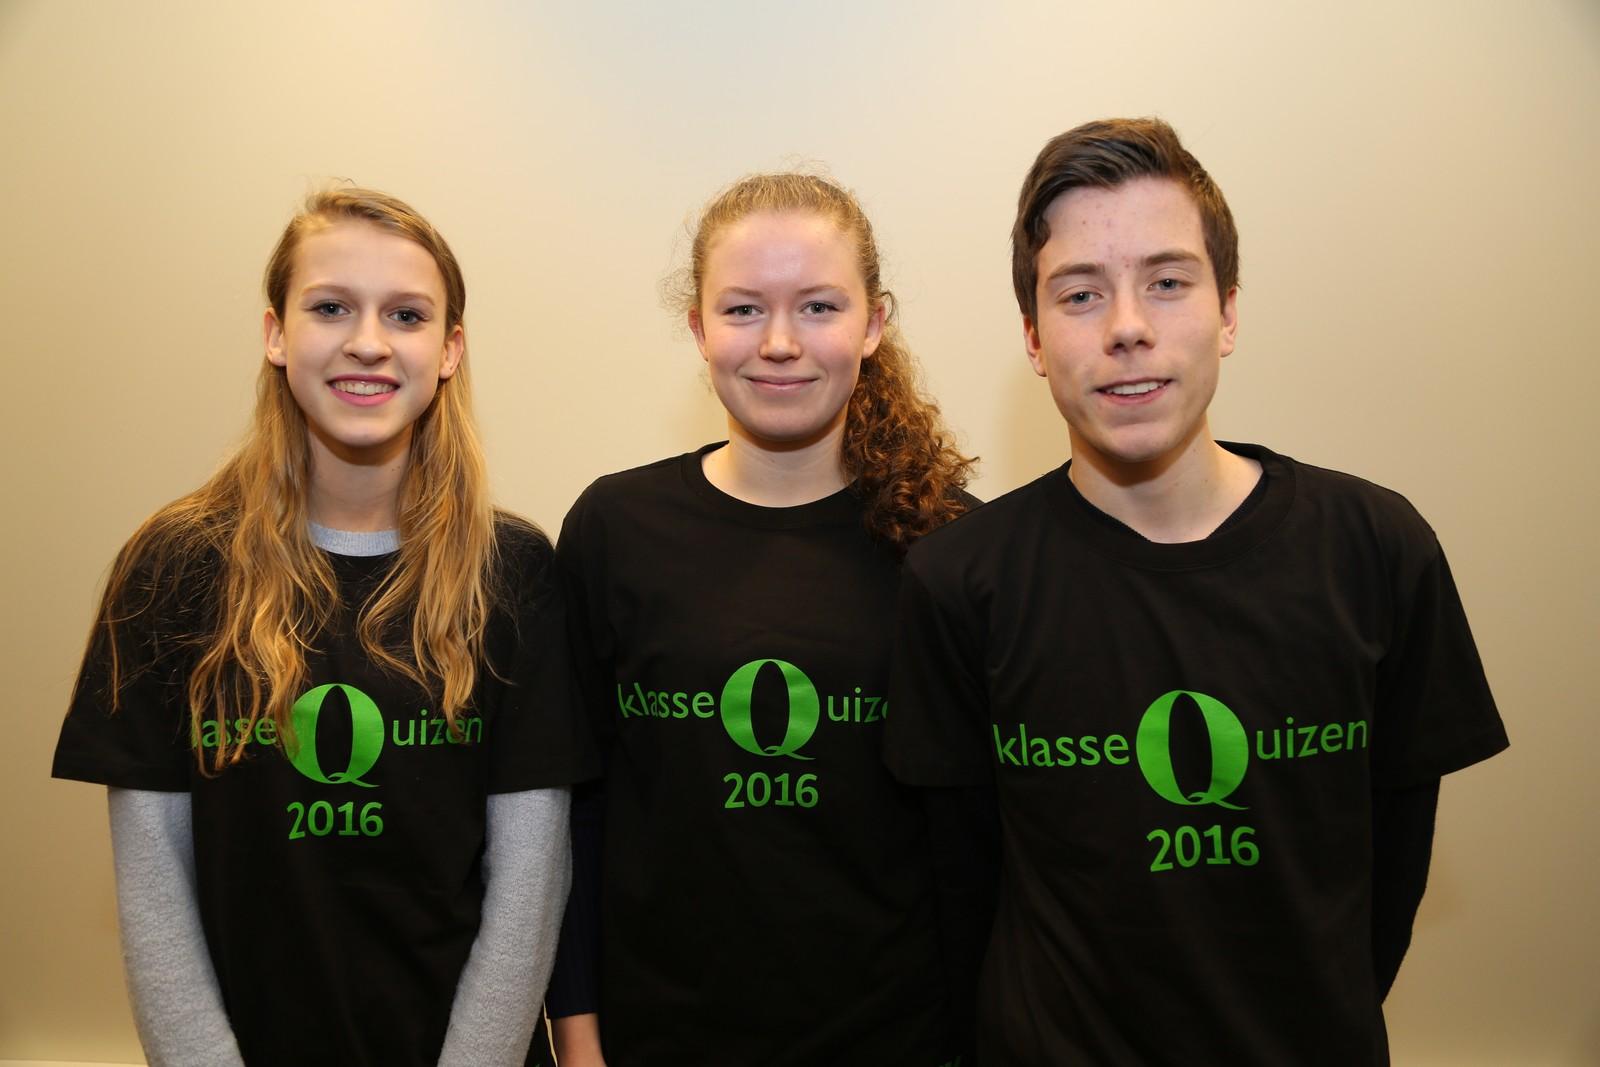 9 POENG: Sola ungdomsskole: Hannah Macfarlane, Ane Wangsholm, Sebastian Kvammen.